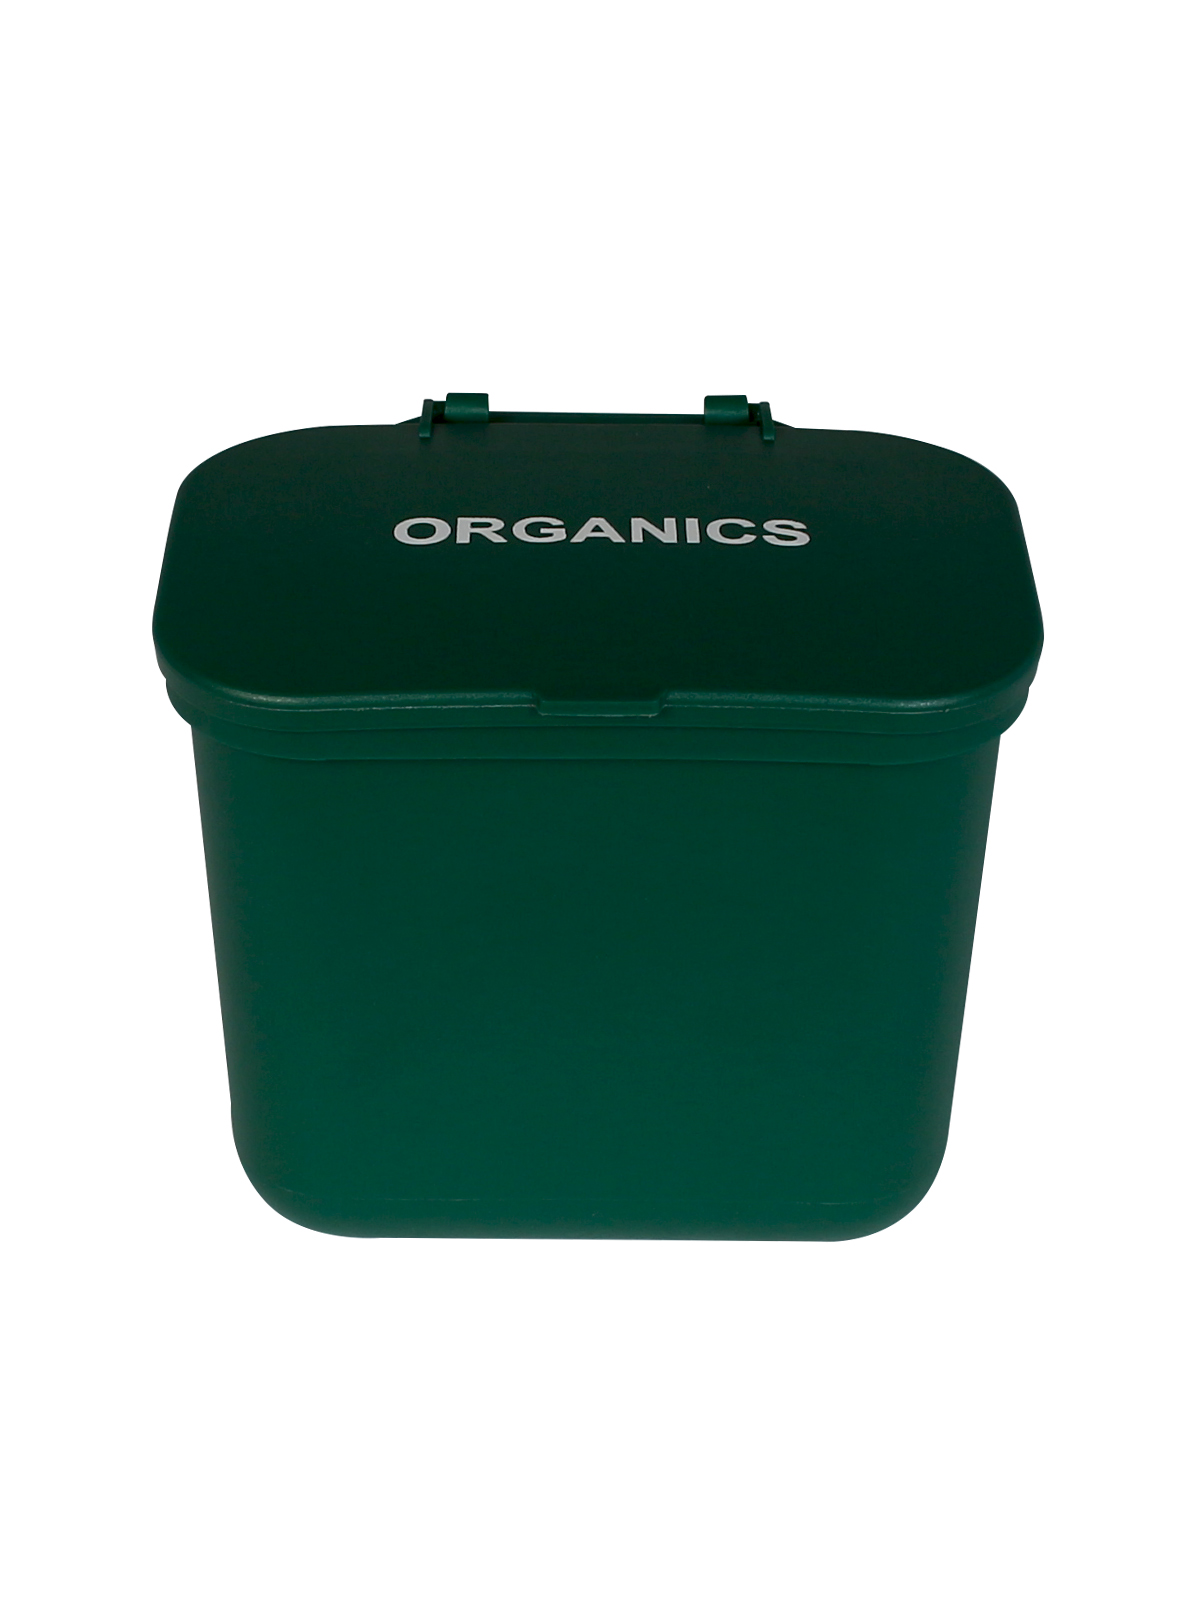 HANGING WASTE BASKET - Single - Organics - Solid Lift - Green